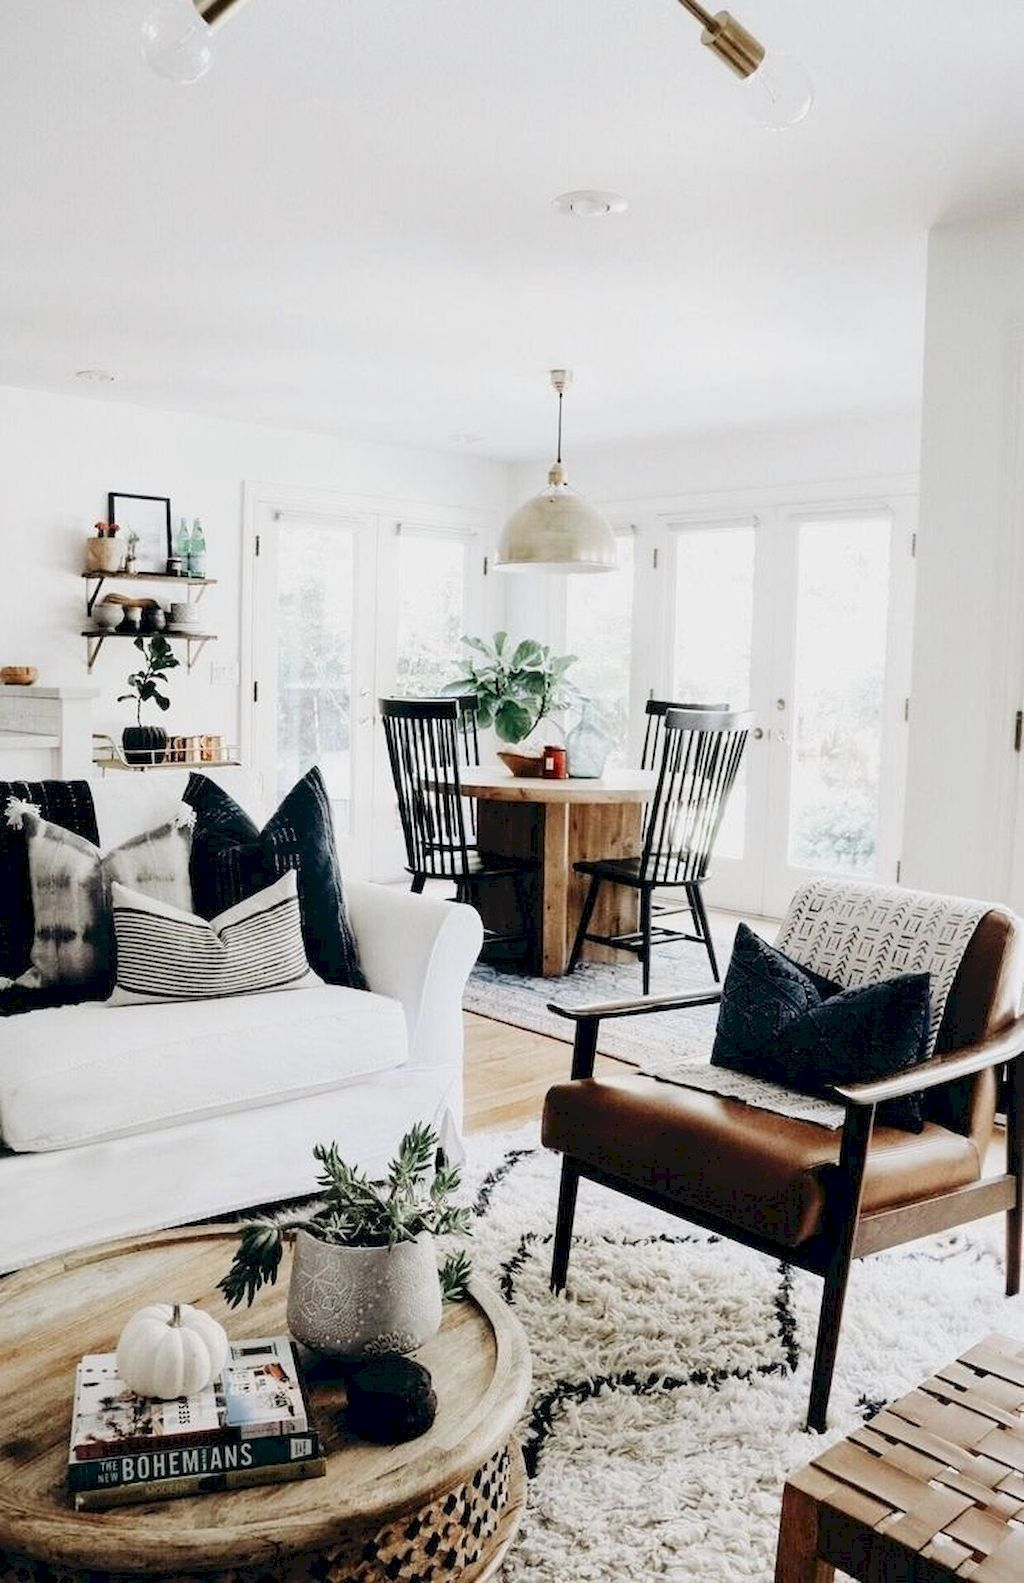 Small Tips And 80 Scandinavian Style Living Room Ideas Https Decoratio Modern Farmhouse Living Room Decor Farm House Living Room Modern Farmhouse Living Room